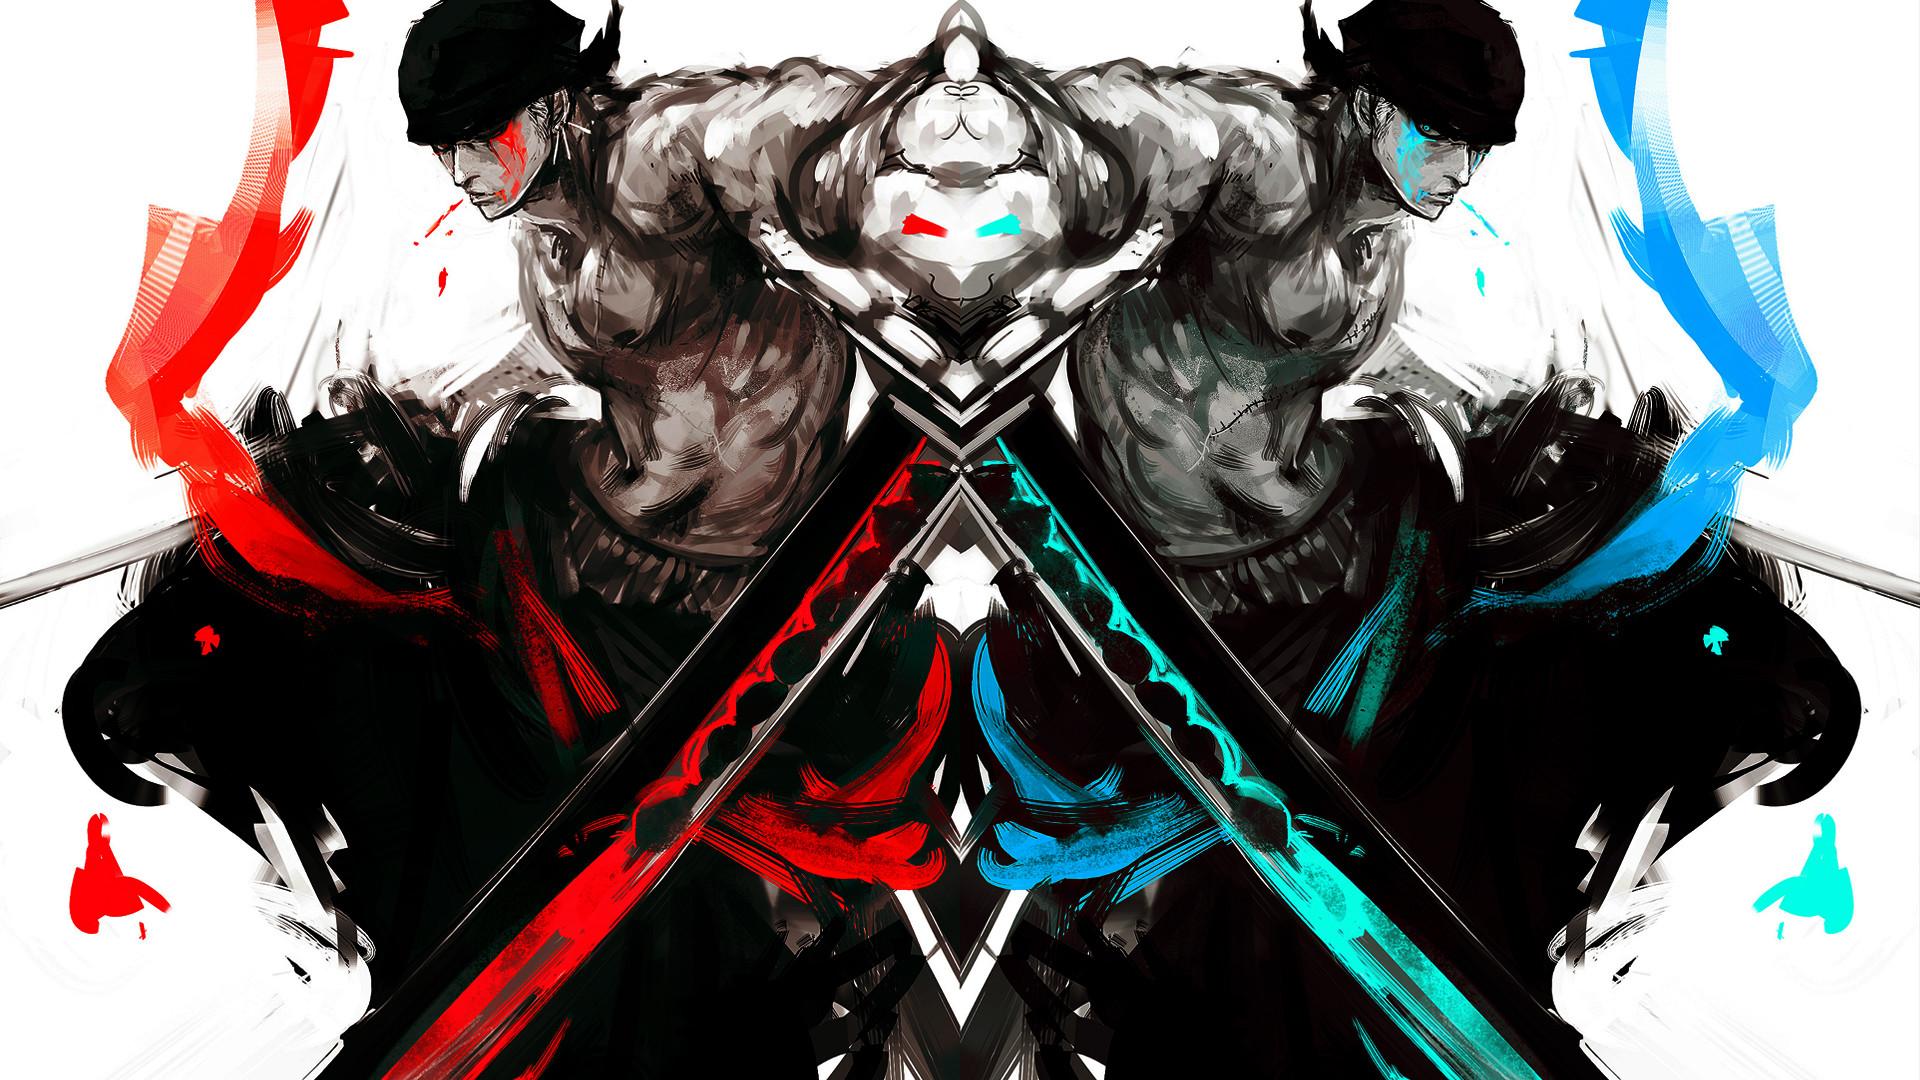 Epic Zoro Wallpaper. roronoa zoro one piece anime hd.